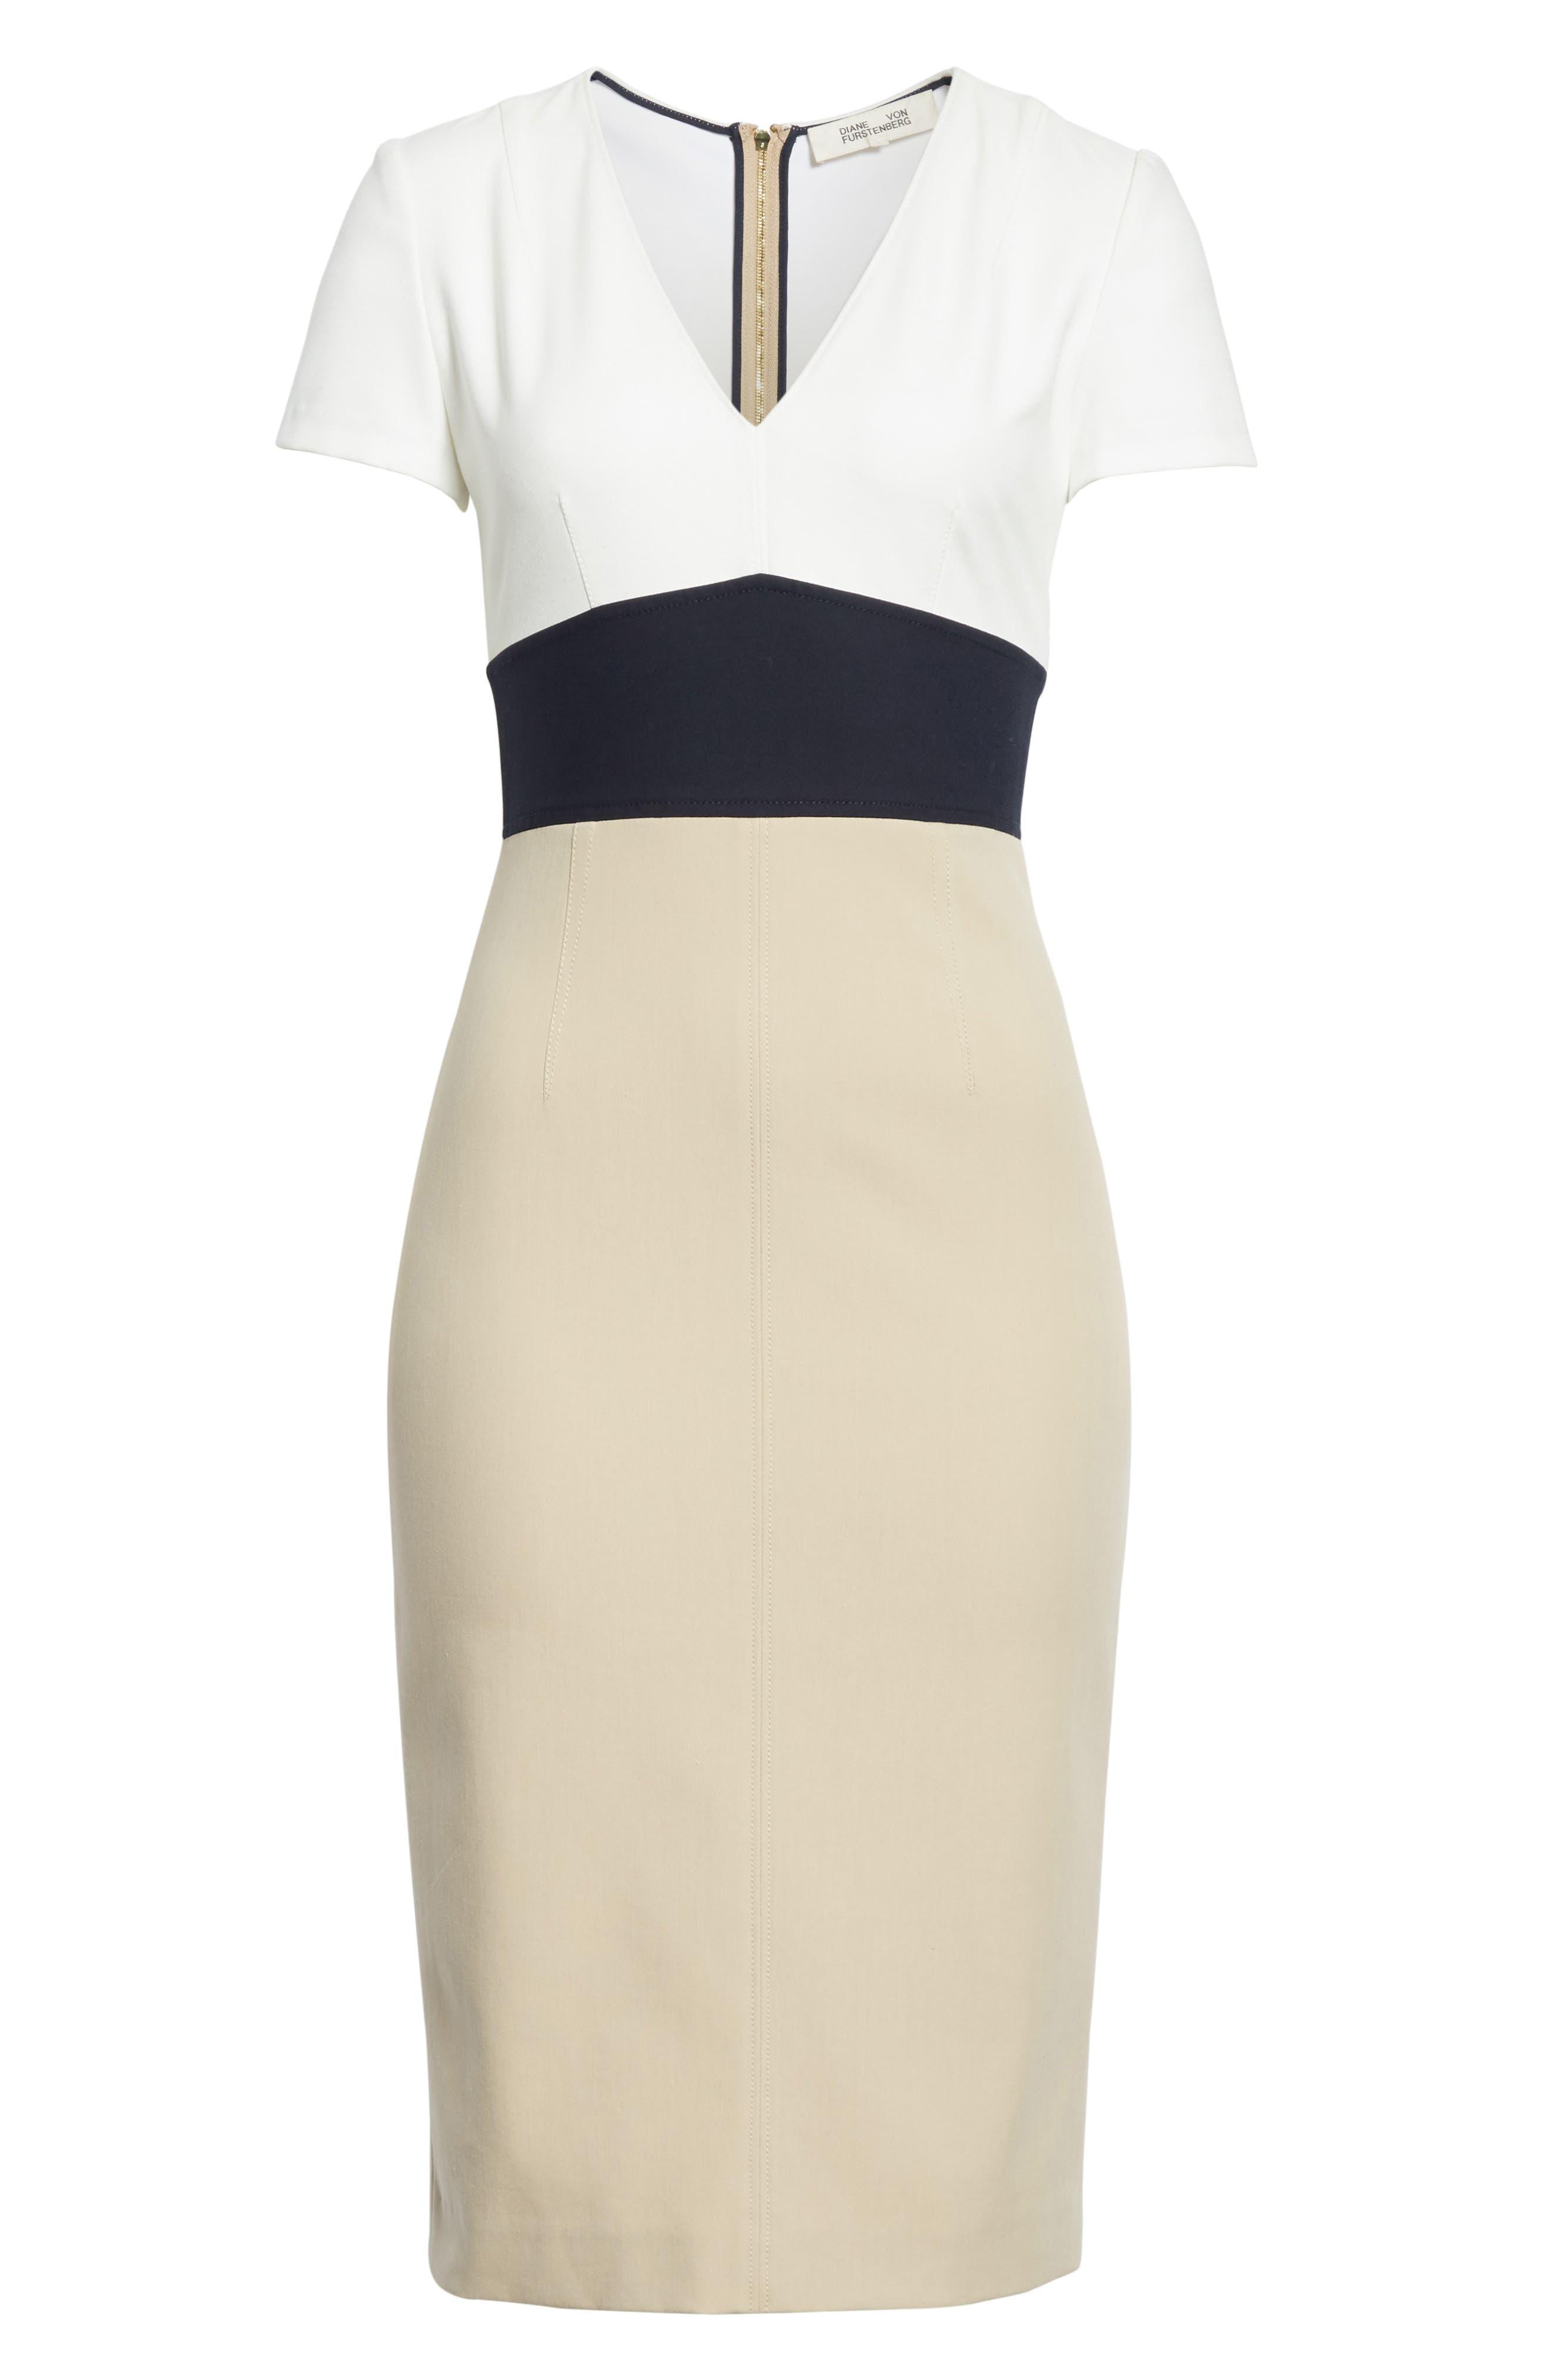 Diane von Furstenberg Colorblock Stretch Cotton Blend Sheath Dress,                             Alternate thumbnail 6, color,